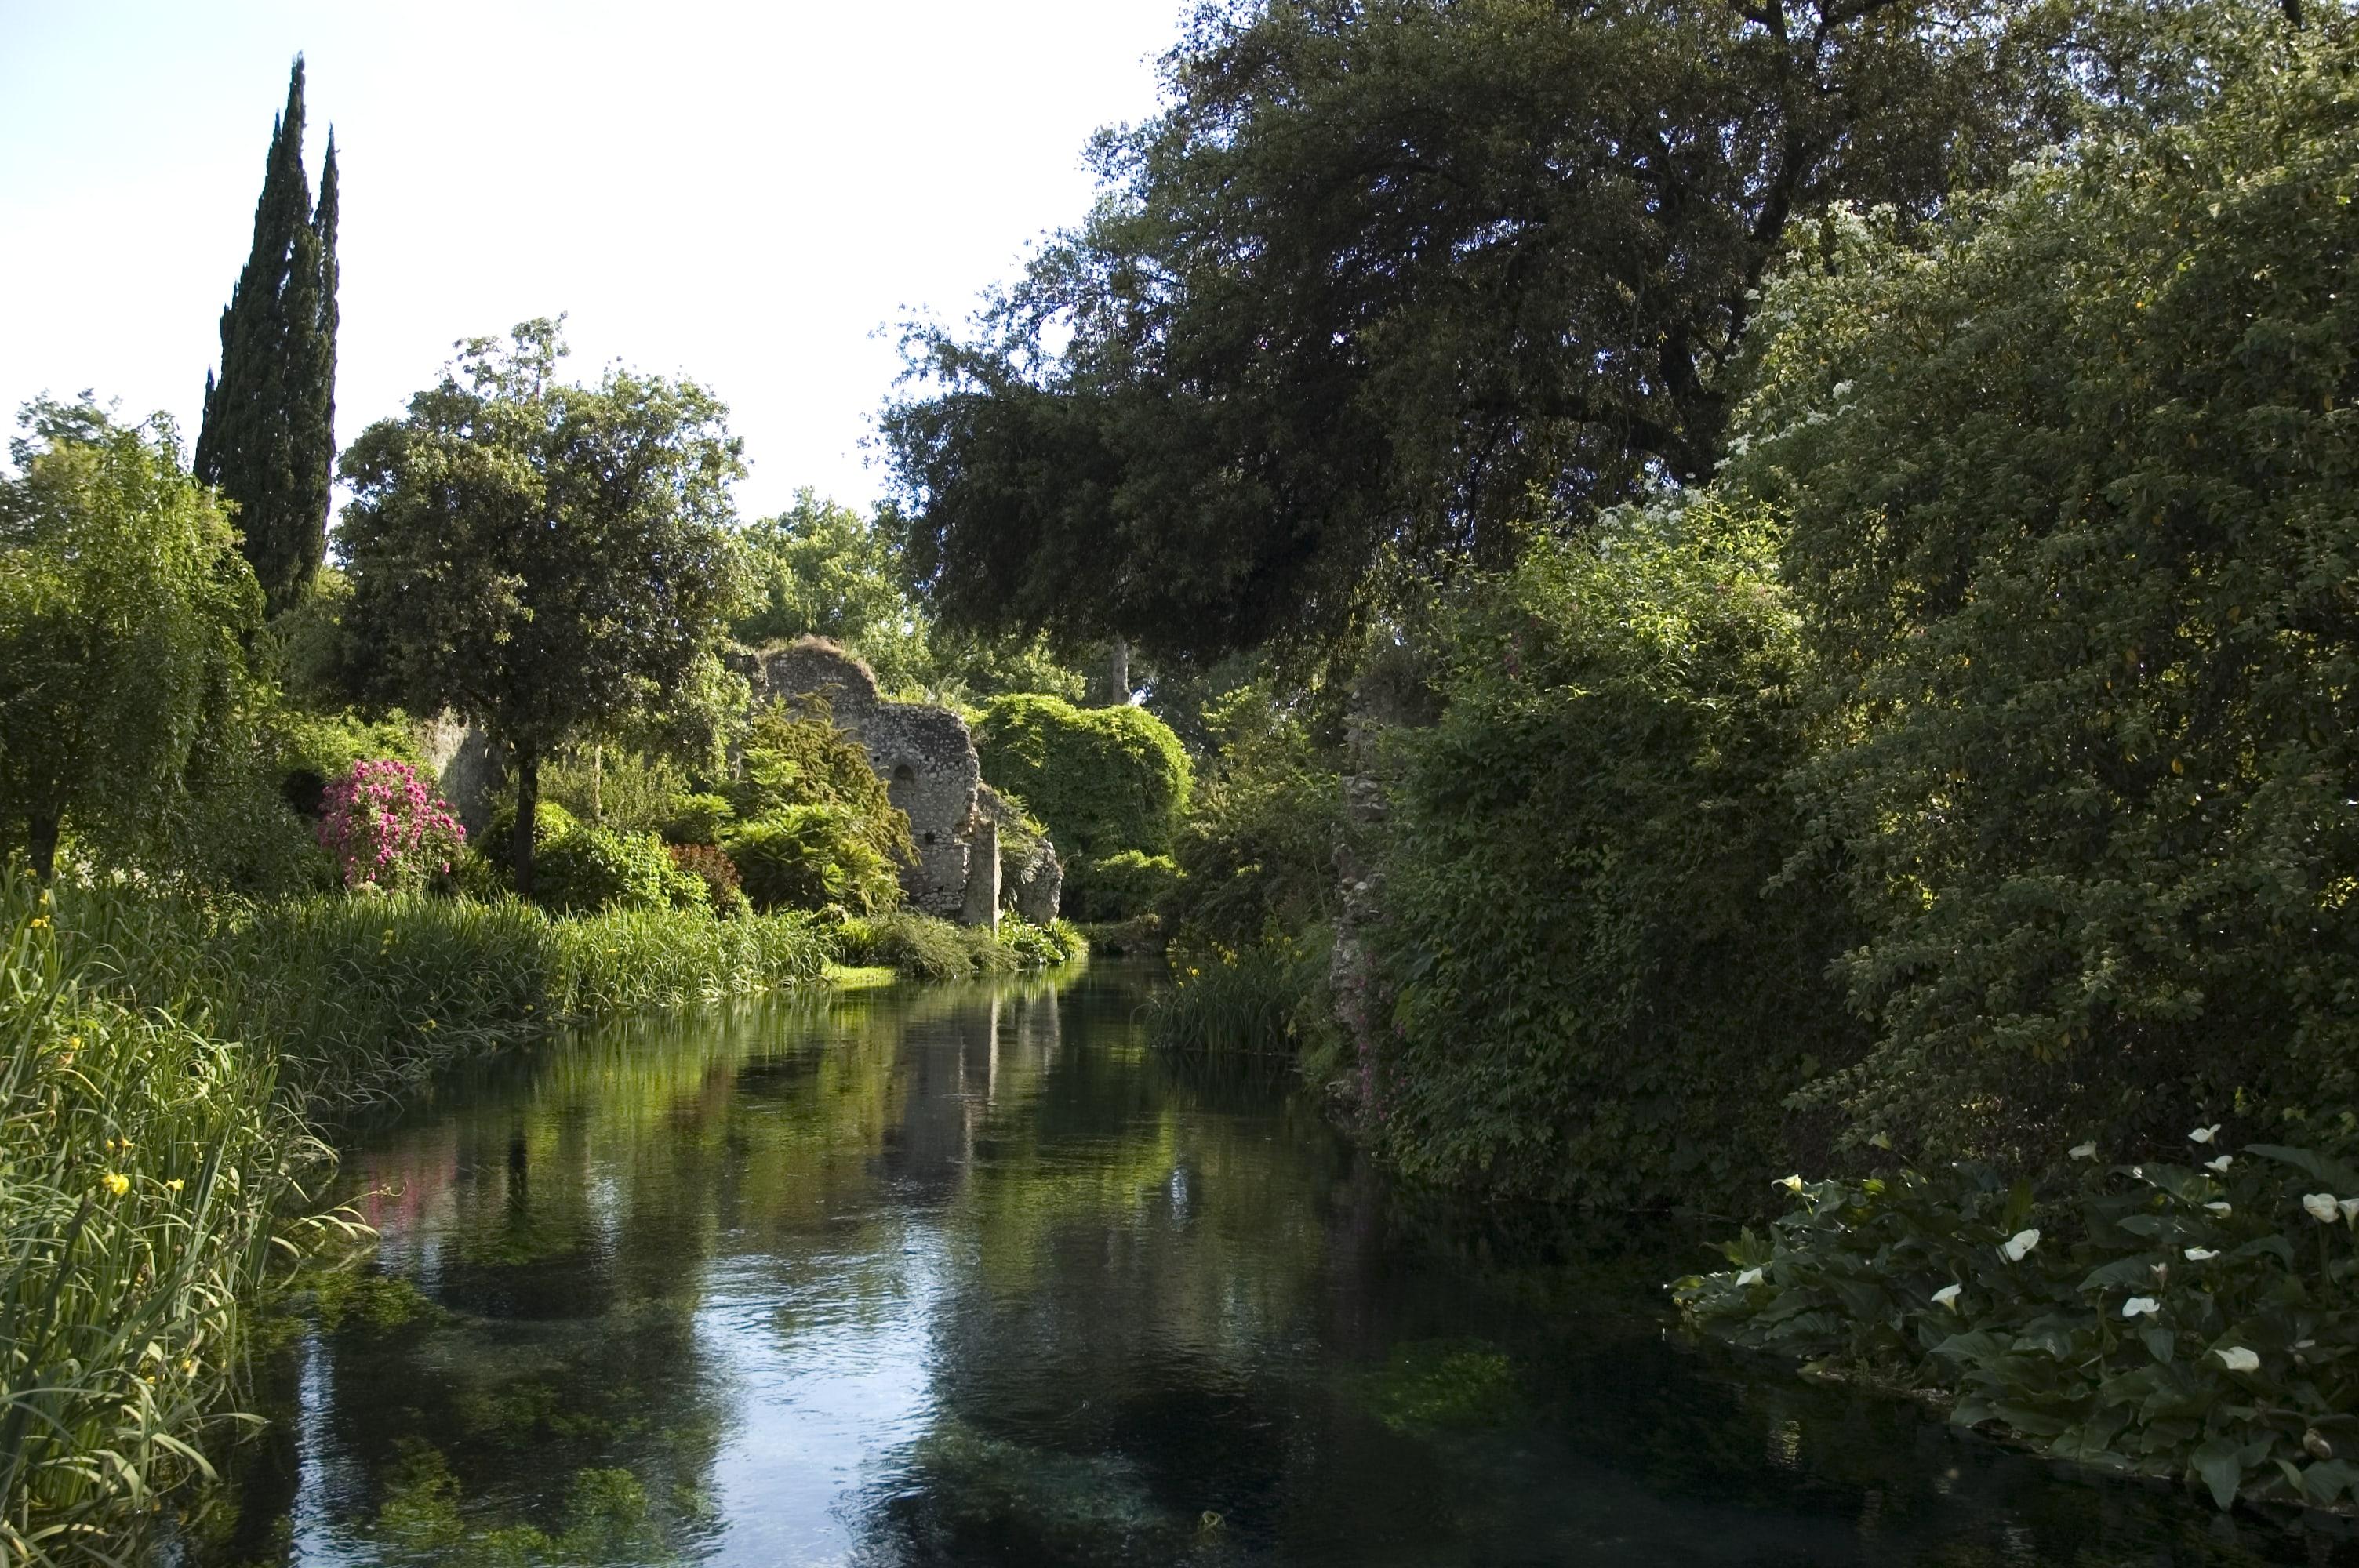 sermoneta-ninfa-giardino3